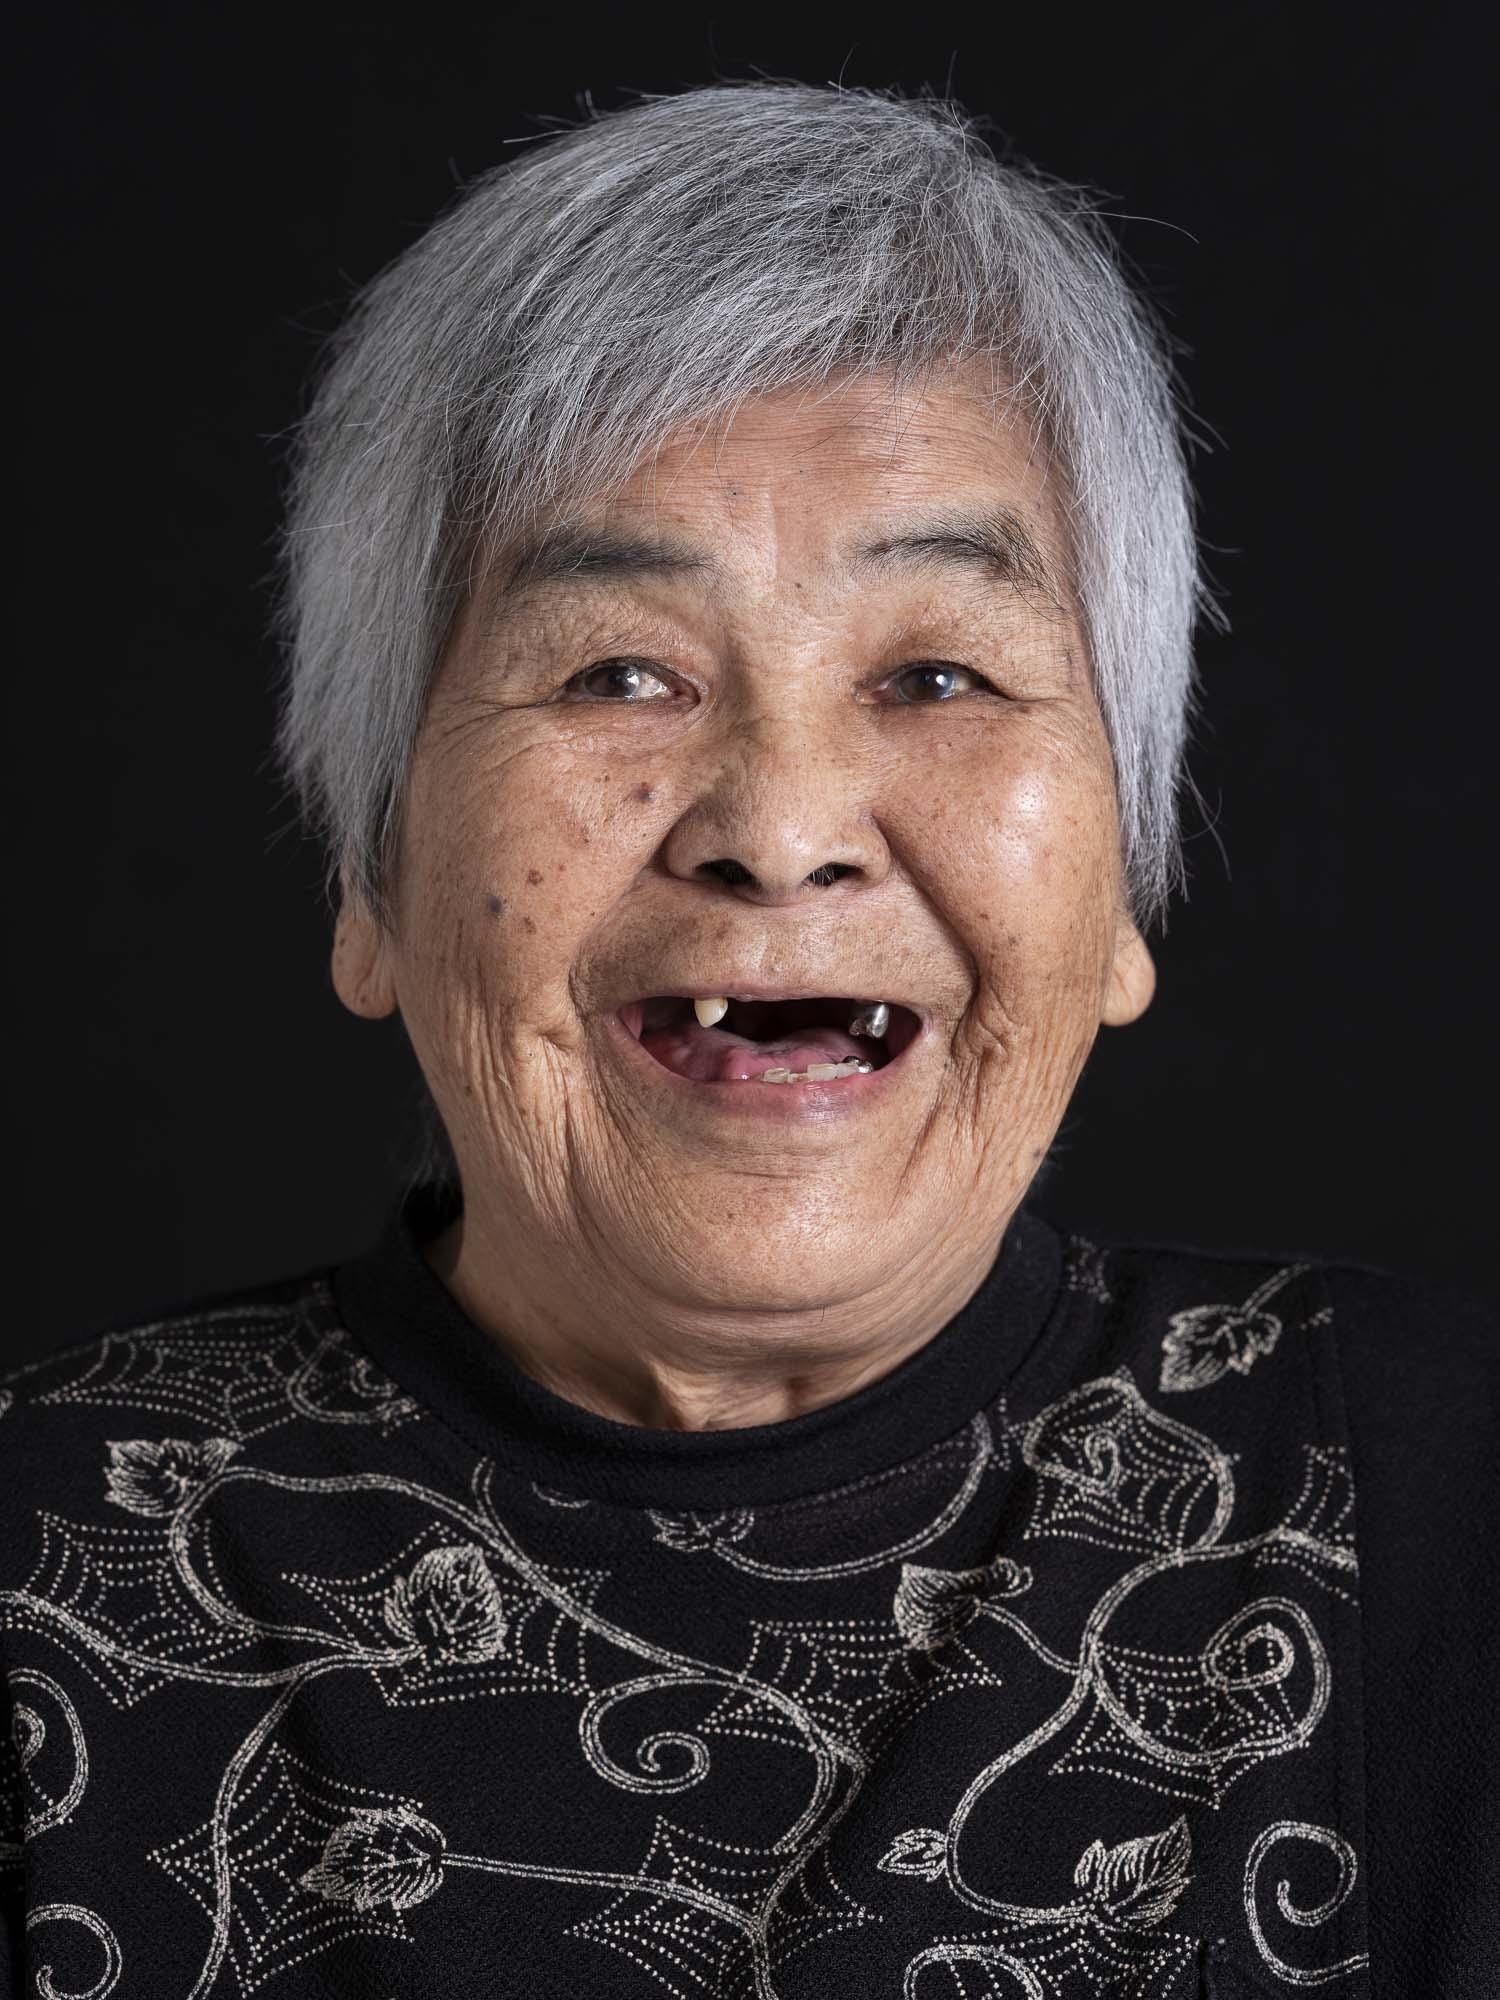 okinawa longevity smile lady old Commercial Editorial Portraiture Documentary Photographer fujifilm Director Singapore Jose Jeuland photography fashion